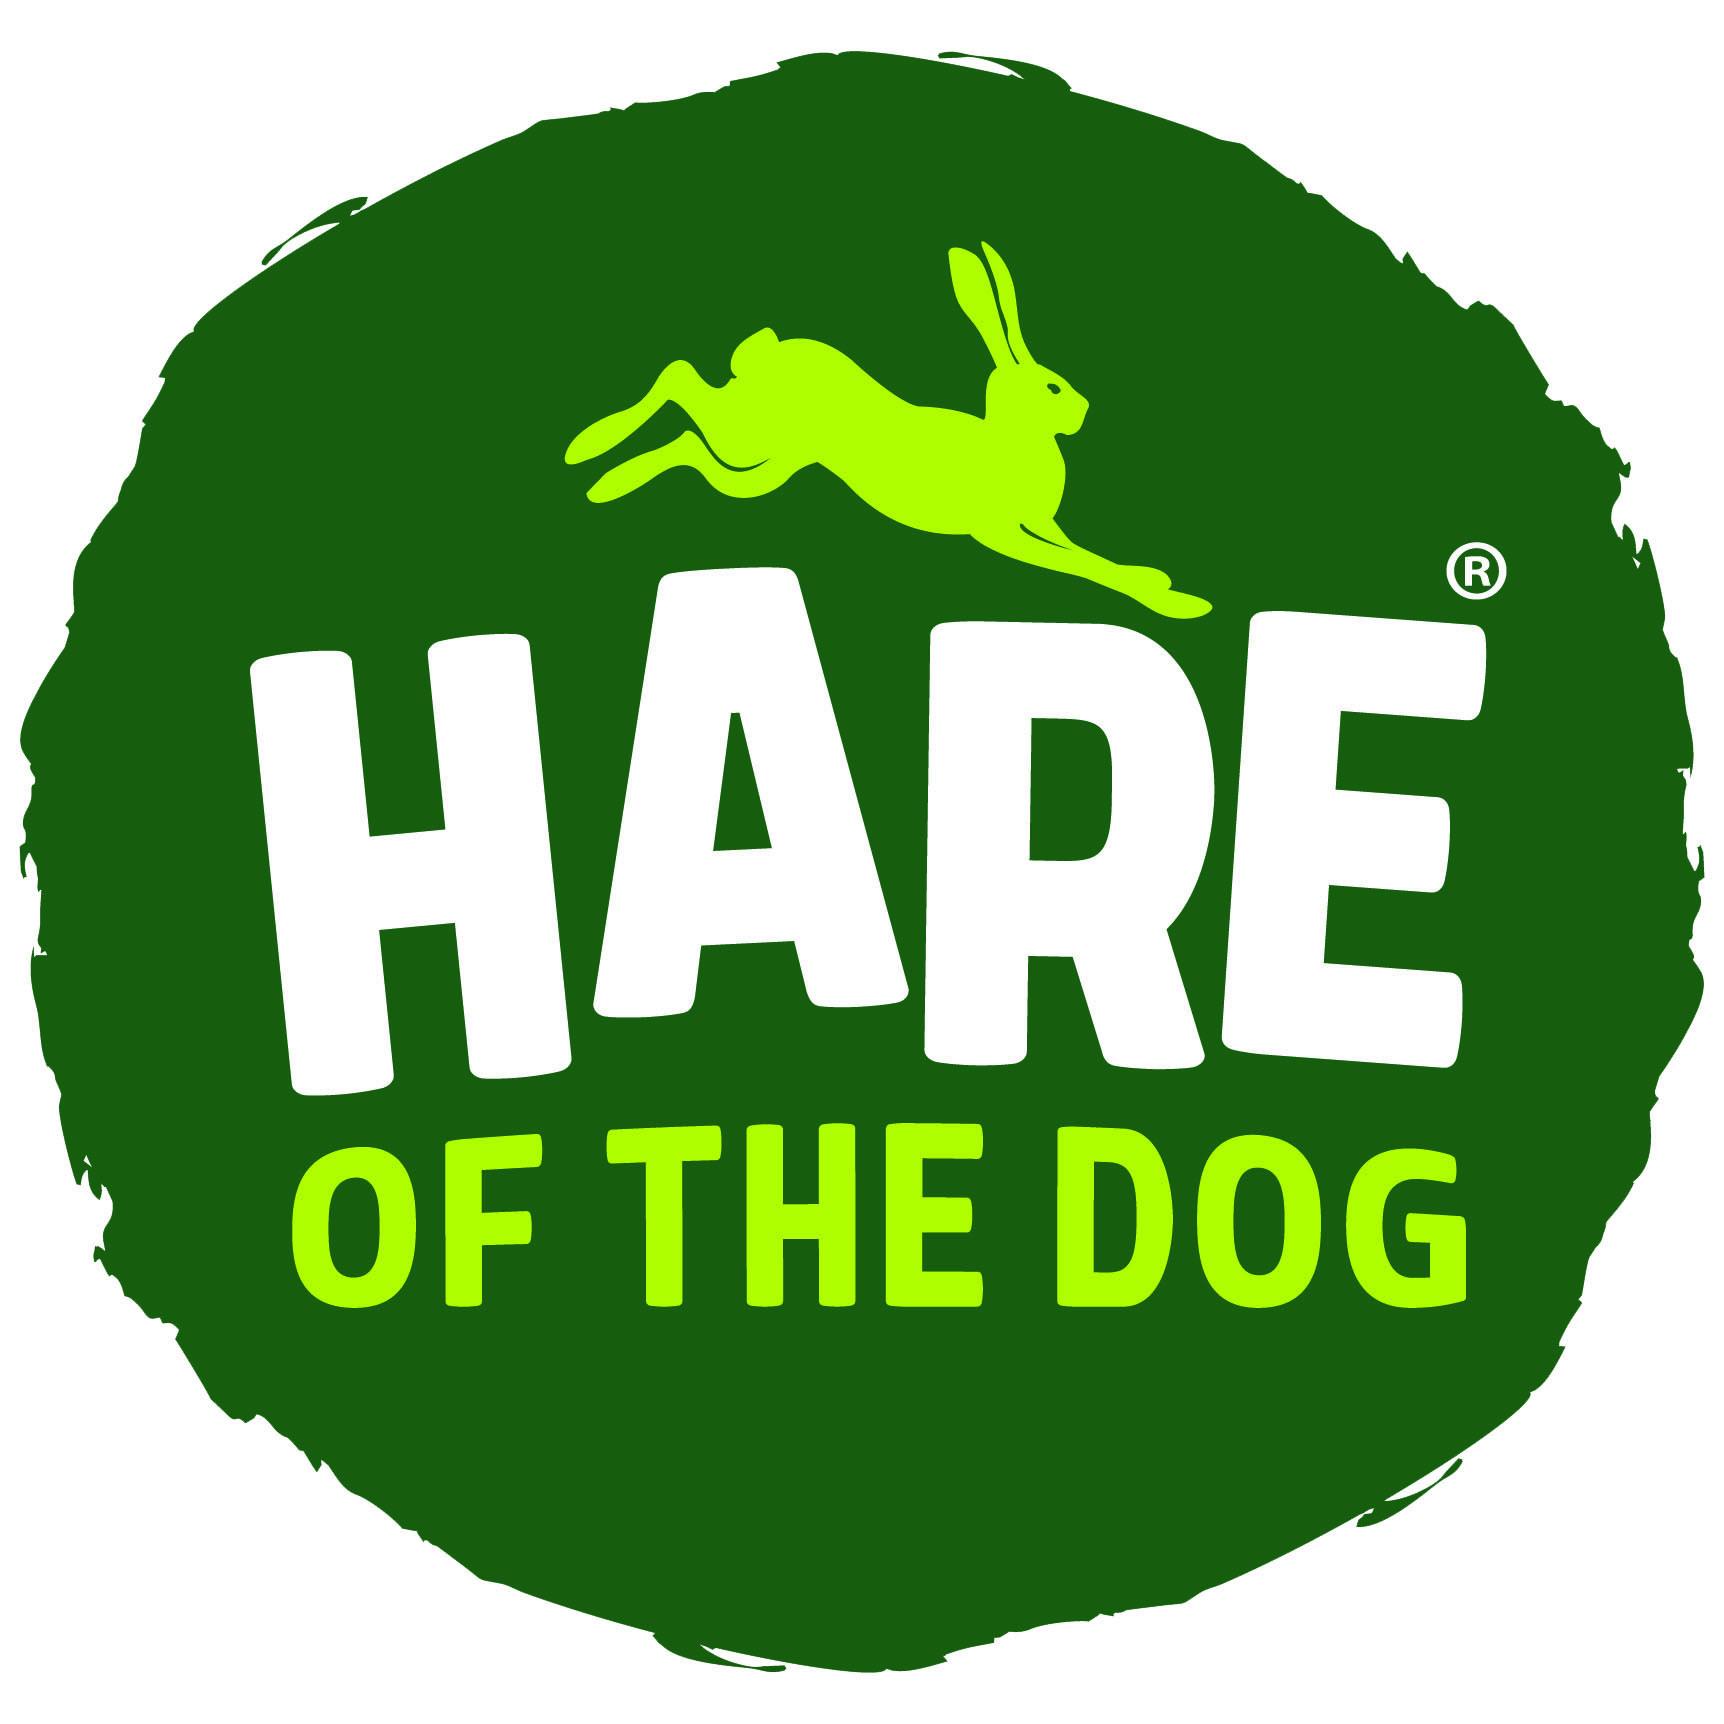 Hare of the Dog Logo Image